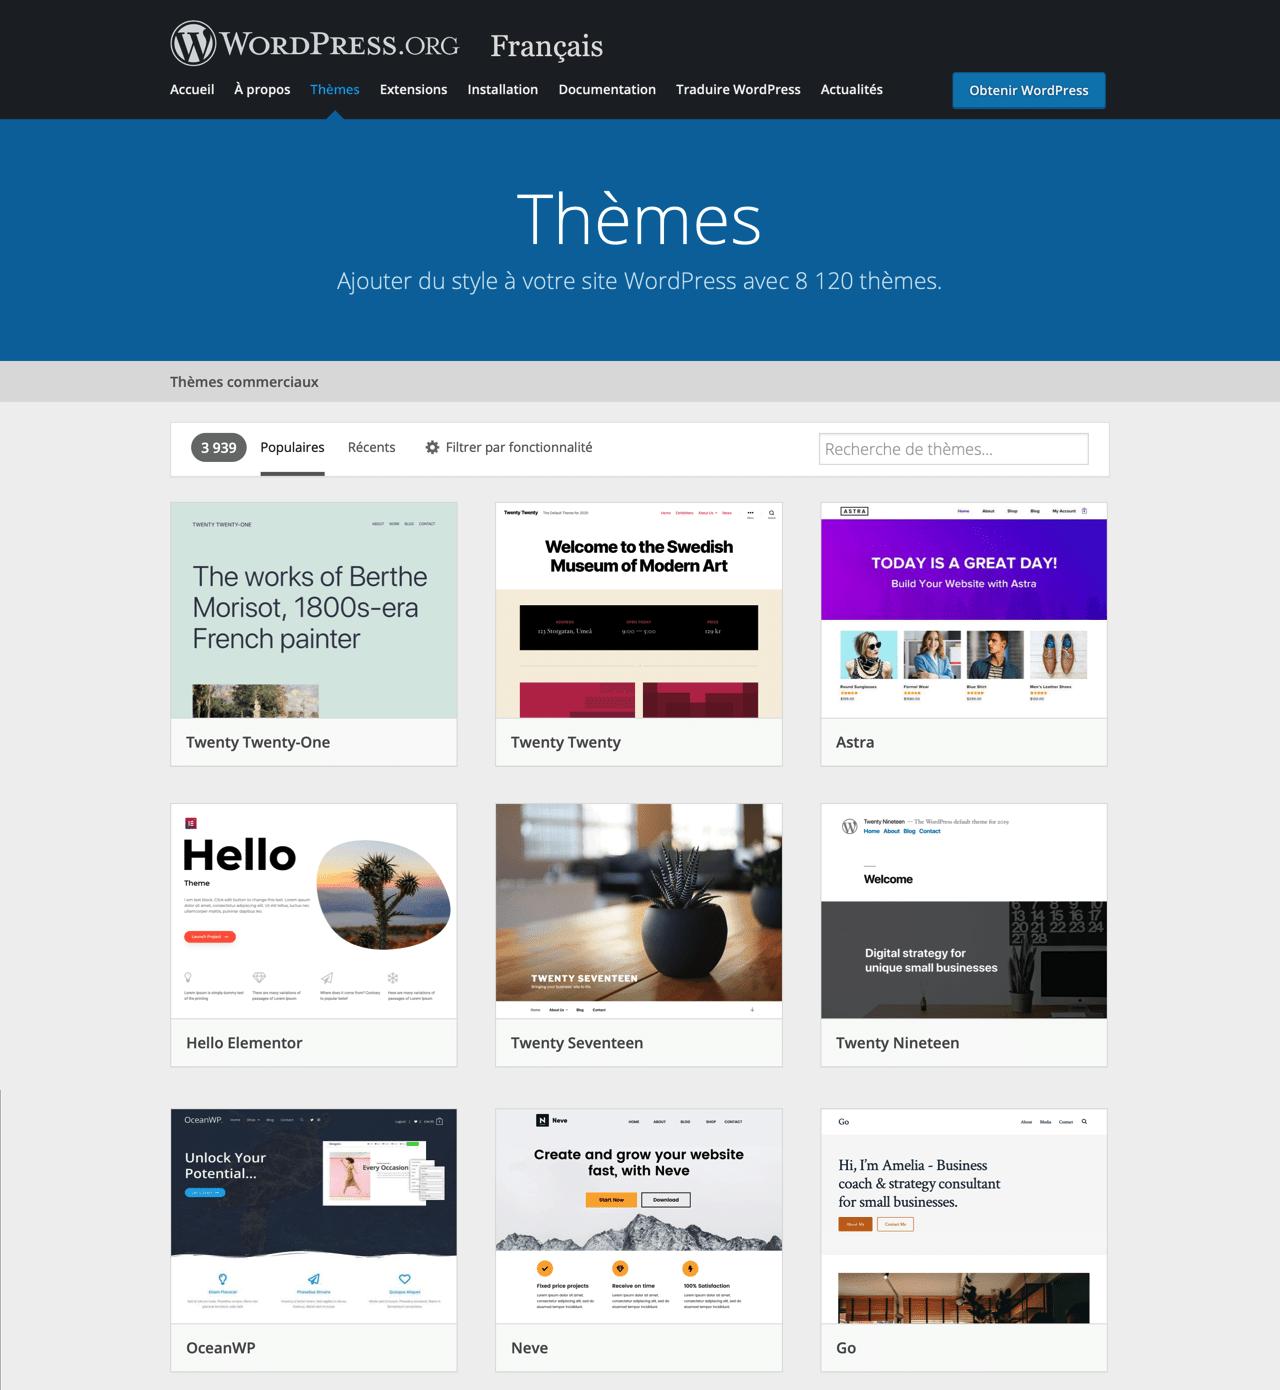 Librairie de Templates gratuits propulsés par WordPress